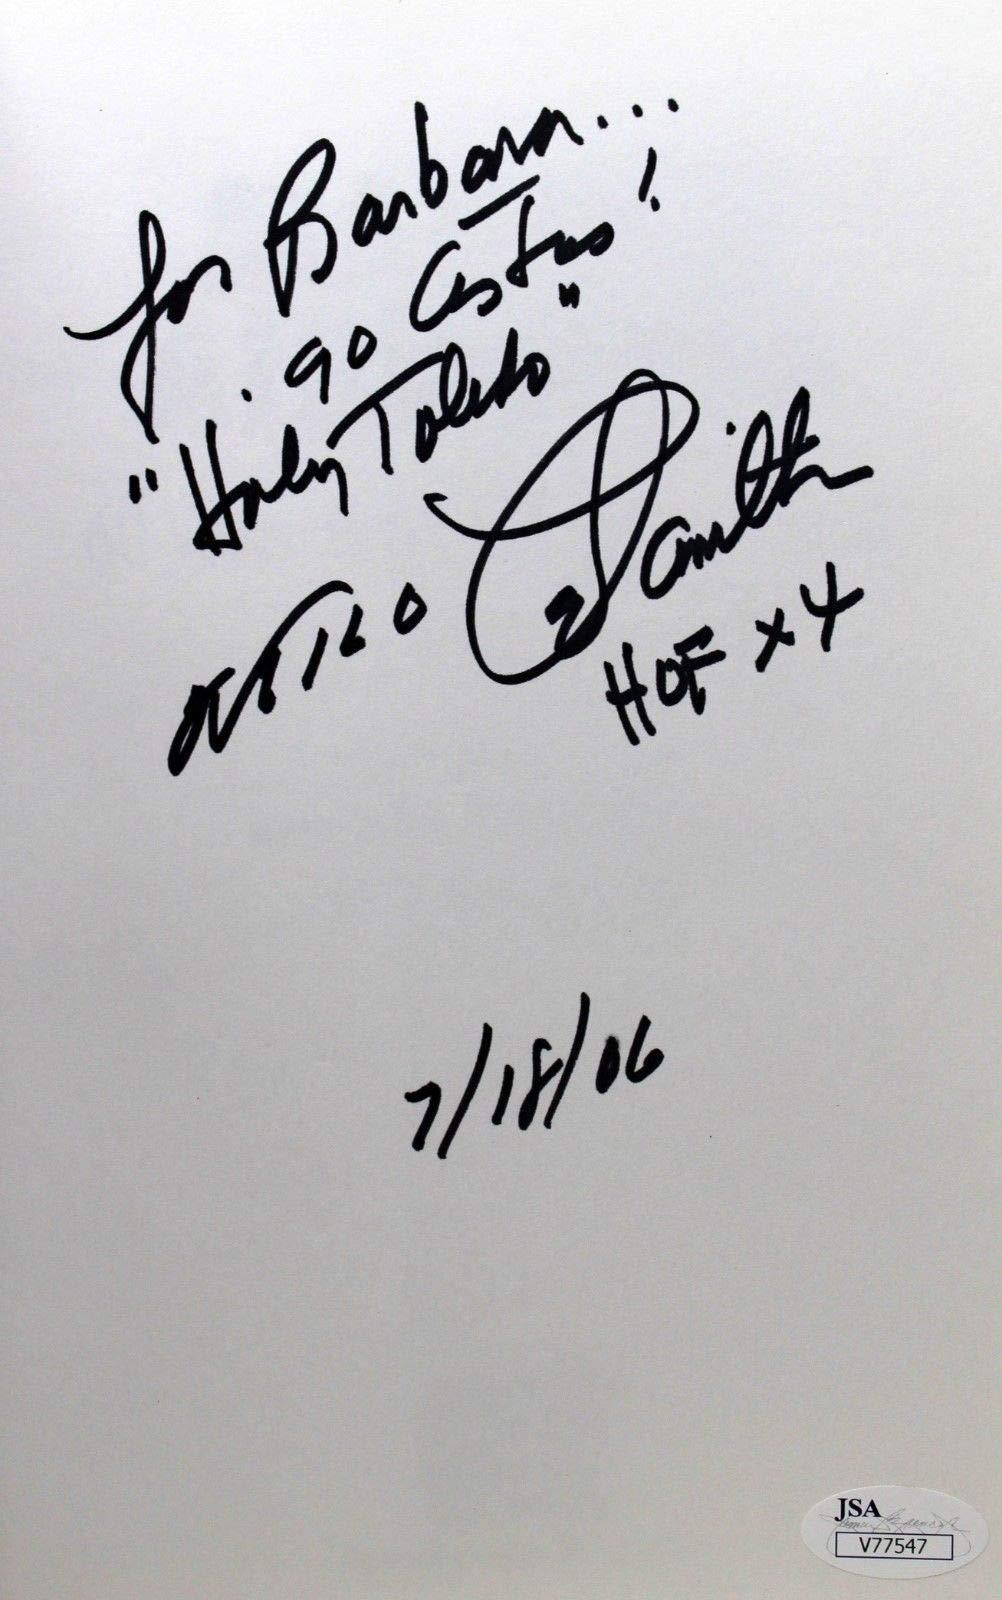 Milo Hamilton Autographed Signed Book Making Airwaves Holy Toledo JSA V77547